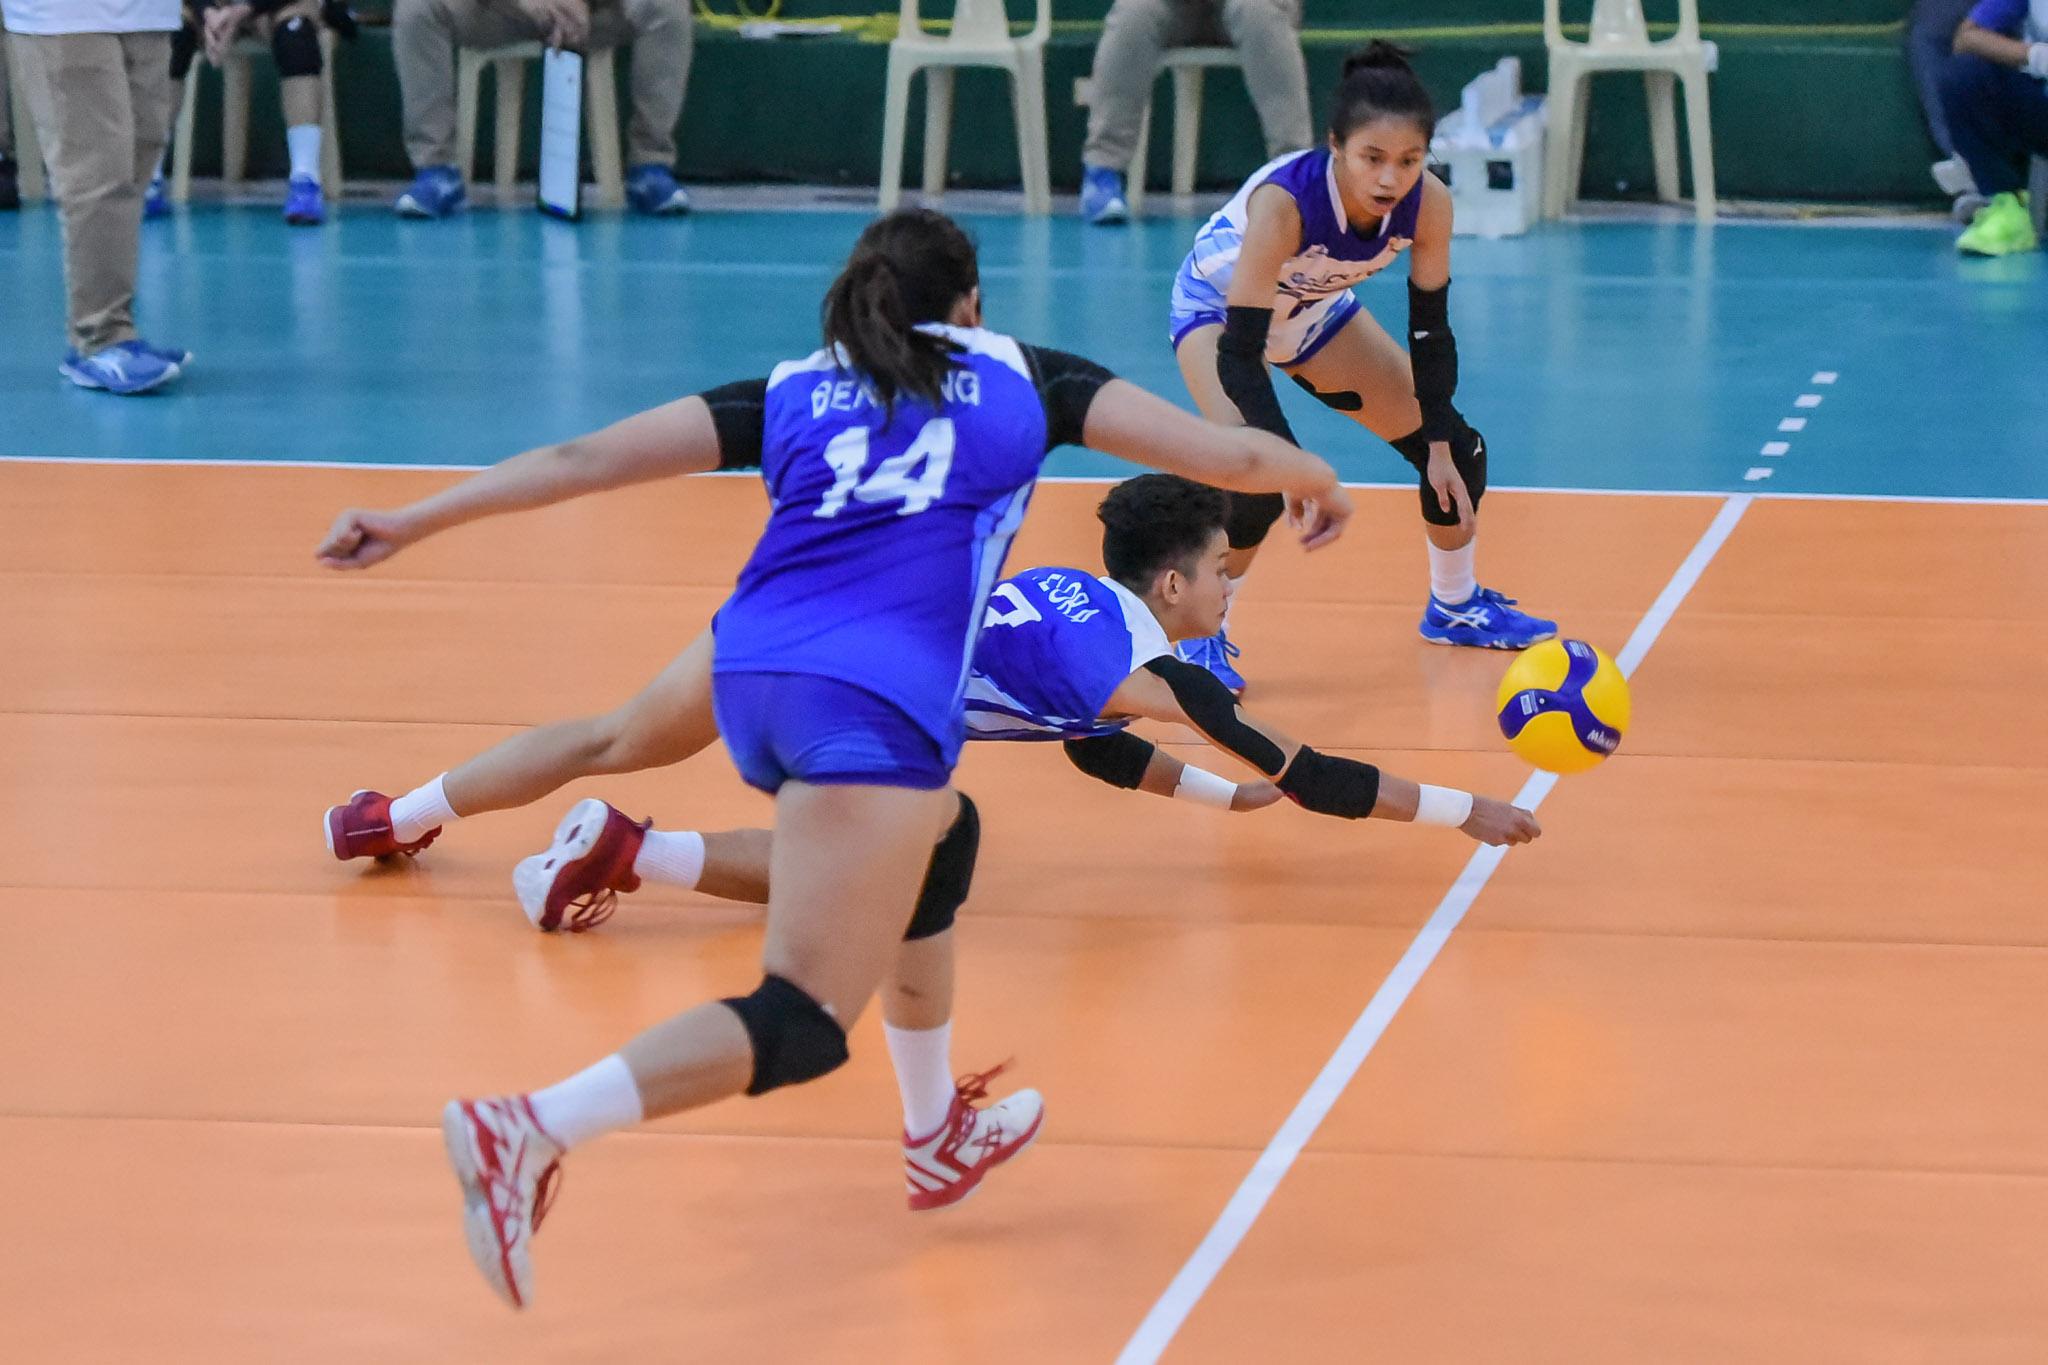 2021-PVL-Open-Sta.-Lucia-vs.-BaliPure-Lai-Bendong-Bernadette-Flora-Julia-Angeles-4615 Chery Tiggo signs Luna, Angeles, Gual for PVL title defense News PVL Volleyball  - philippine sports news